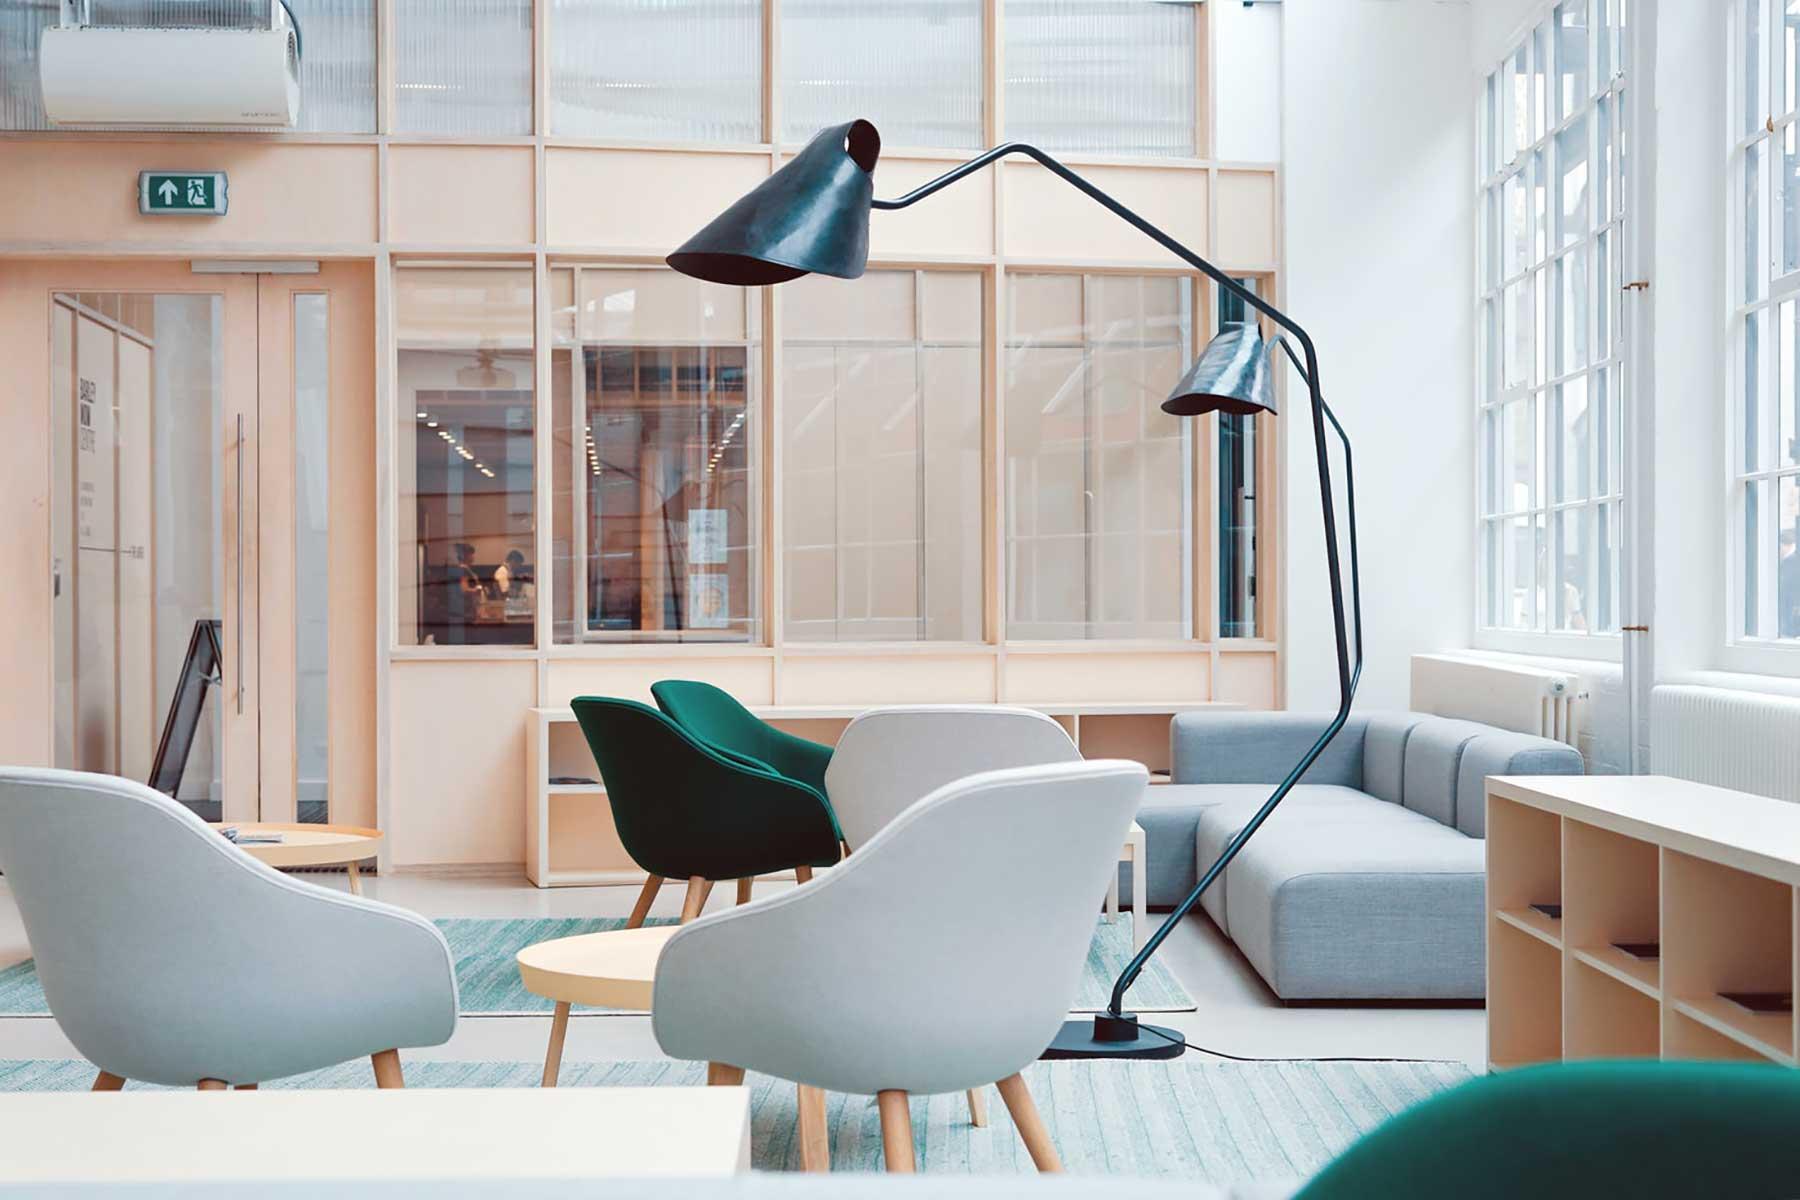 Mobiliario de estilo moderno